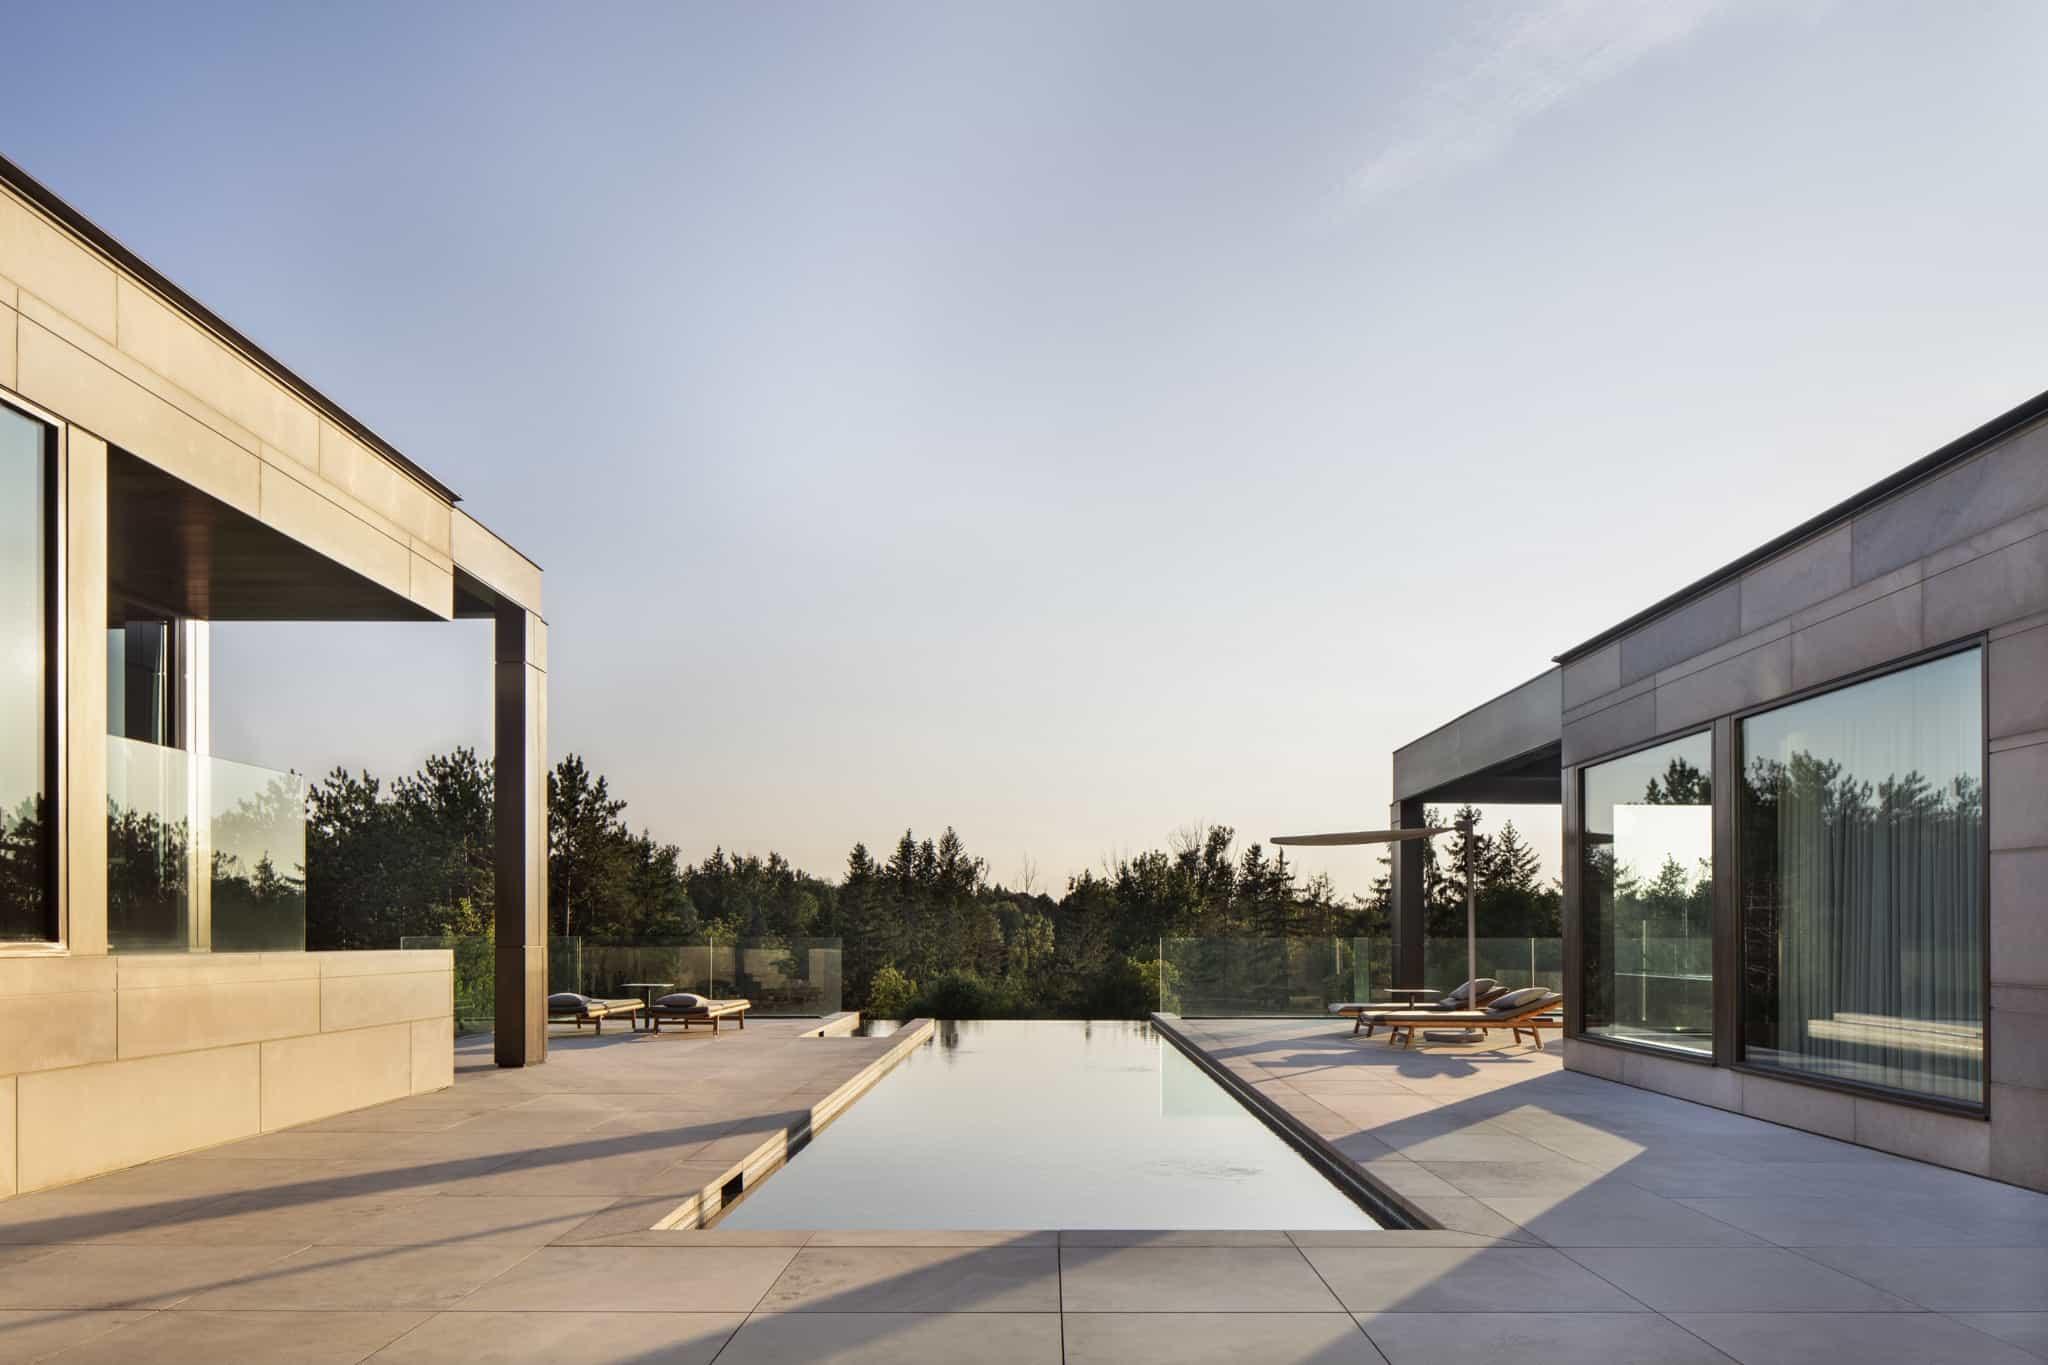 Studio Munge_Private Residence_11_Adrien Williams_web